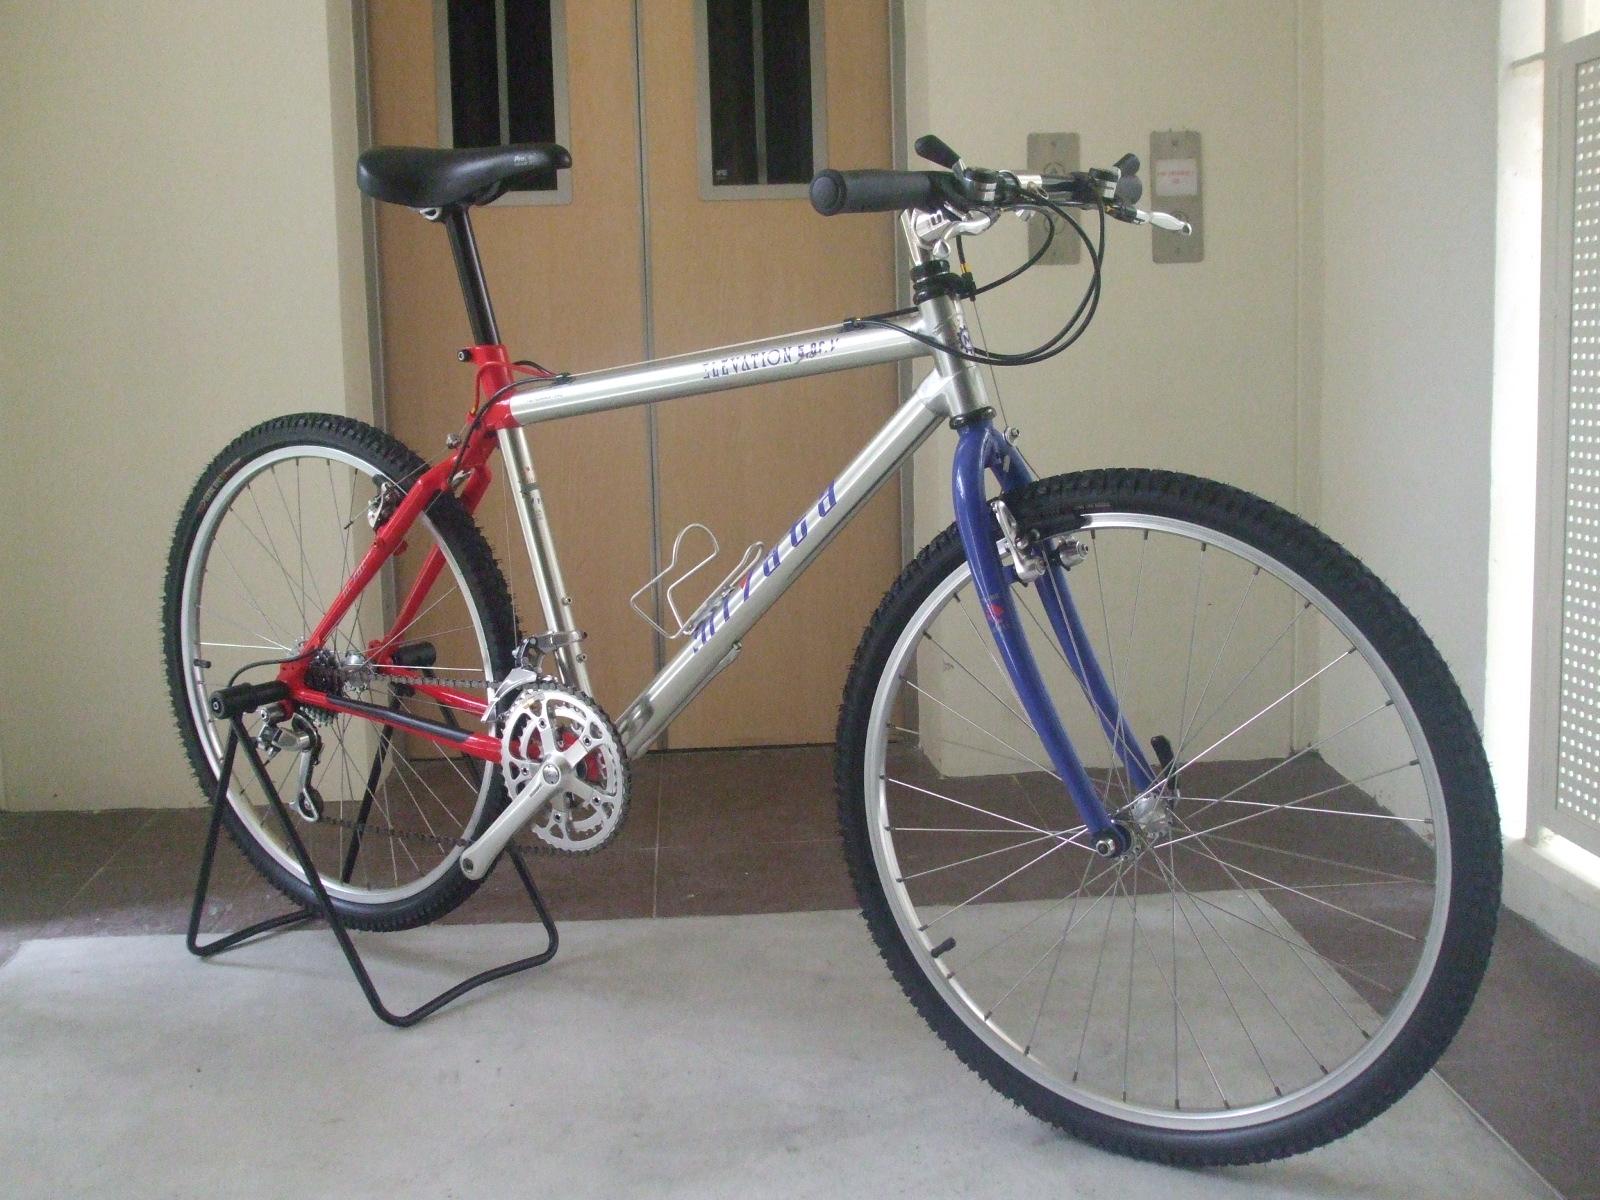 Bake-a-Bike: 1992 Original Miyata Elevation 5,000